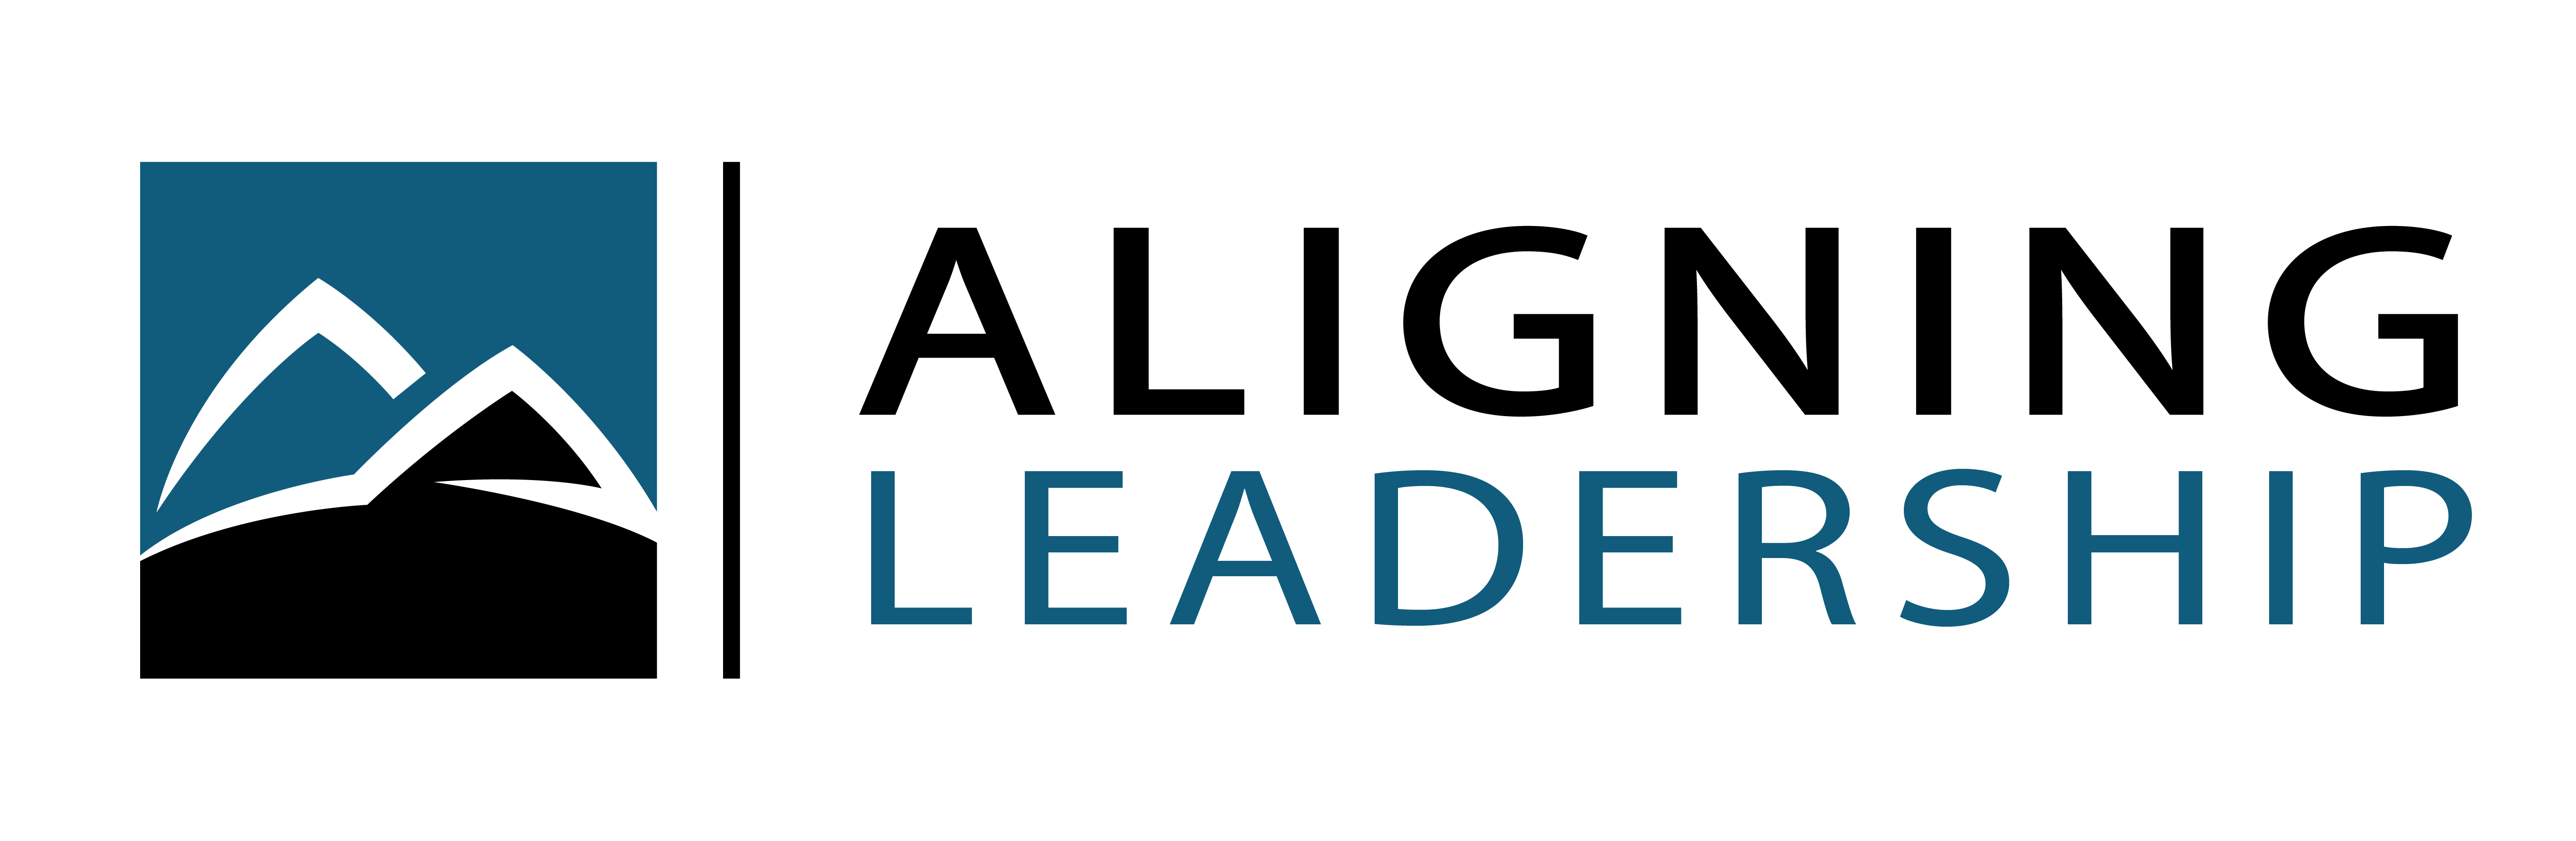 Aligning Leadership